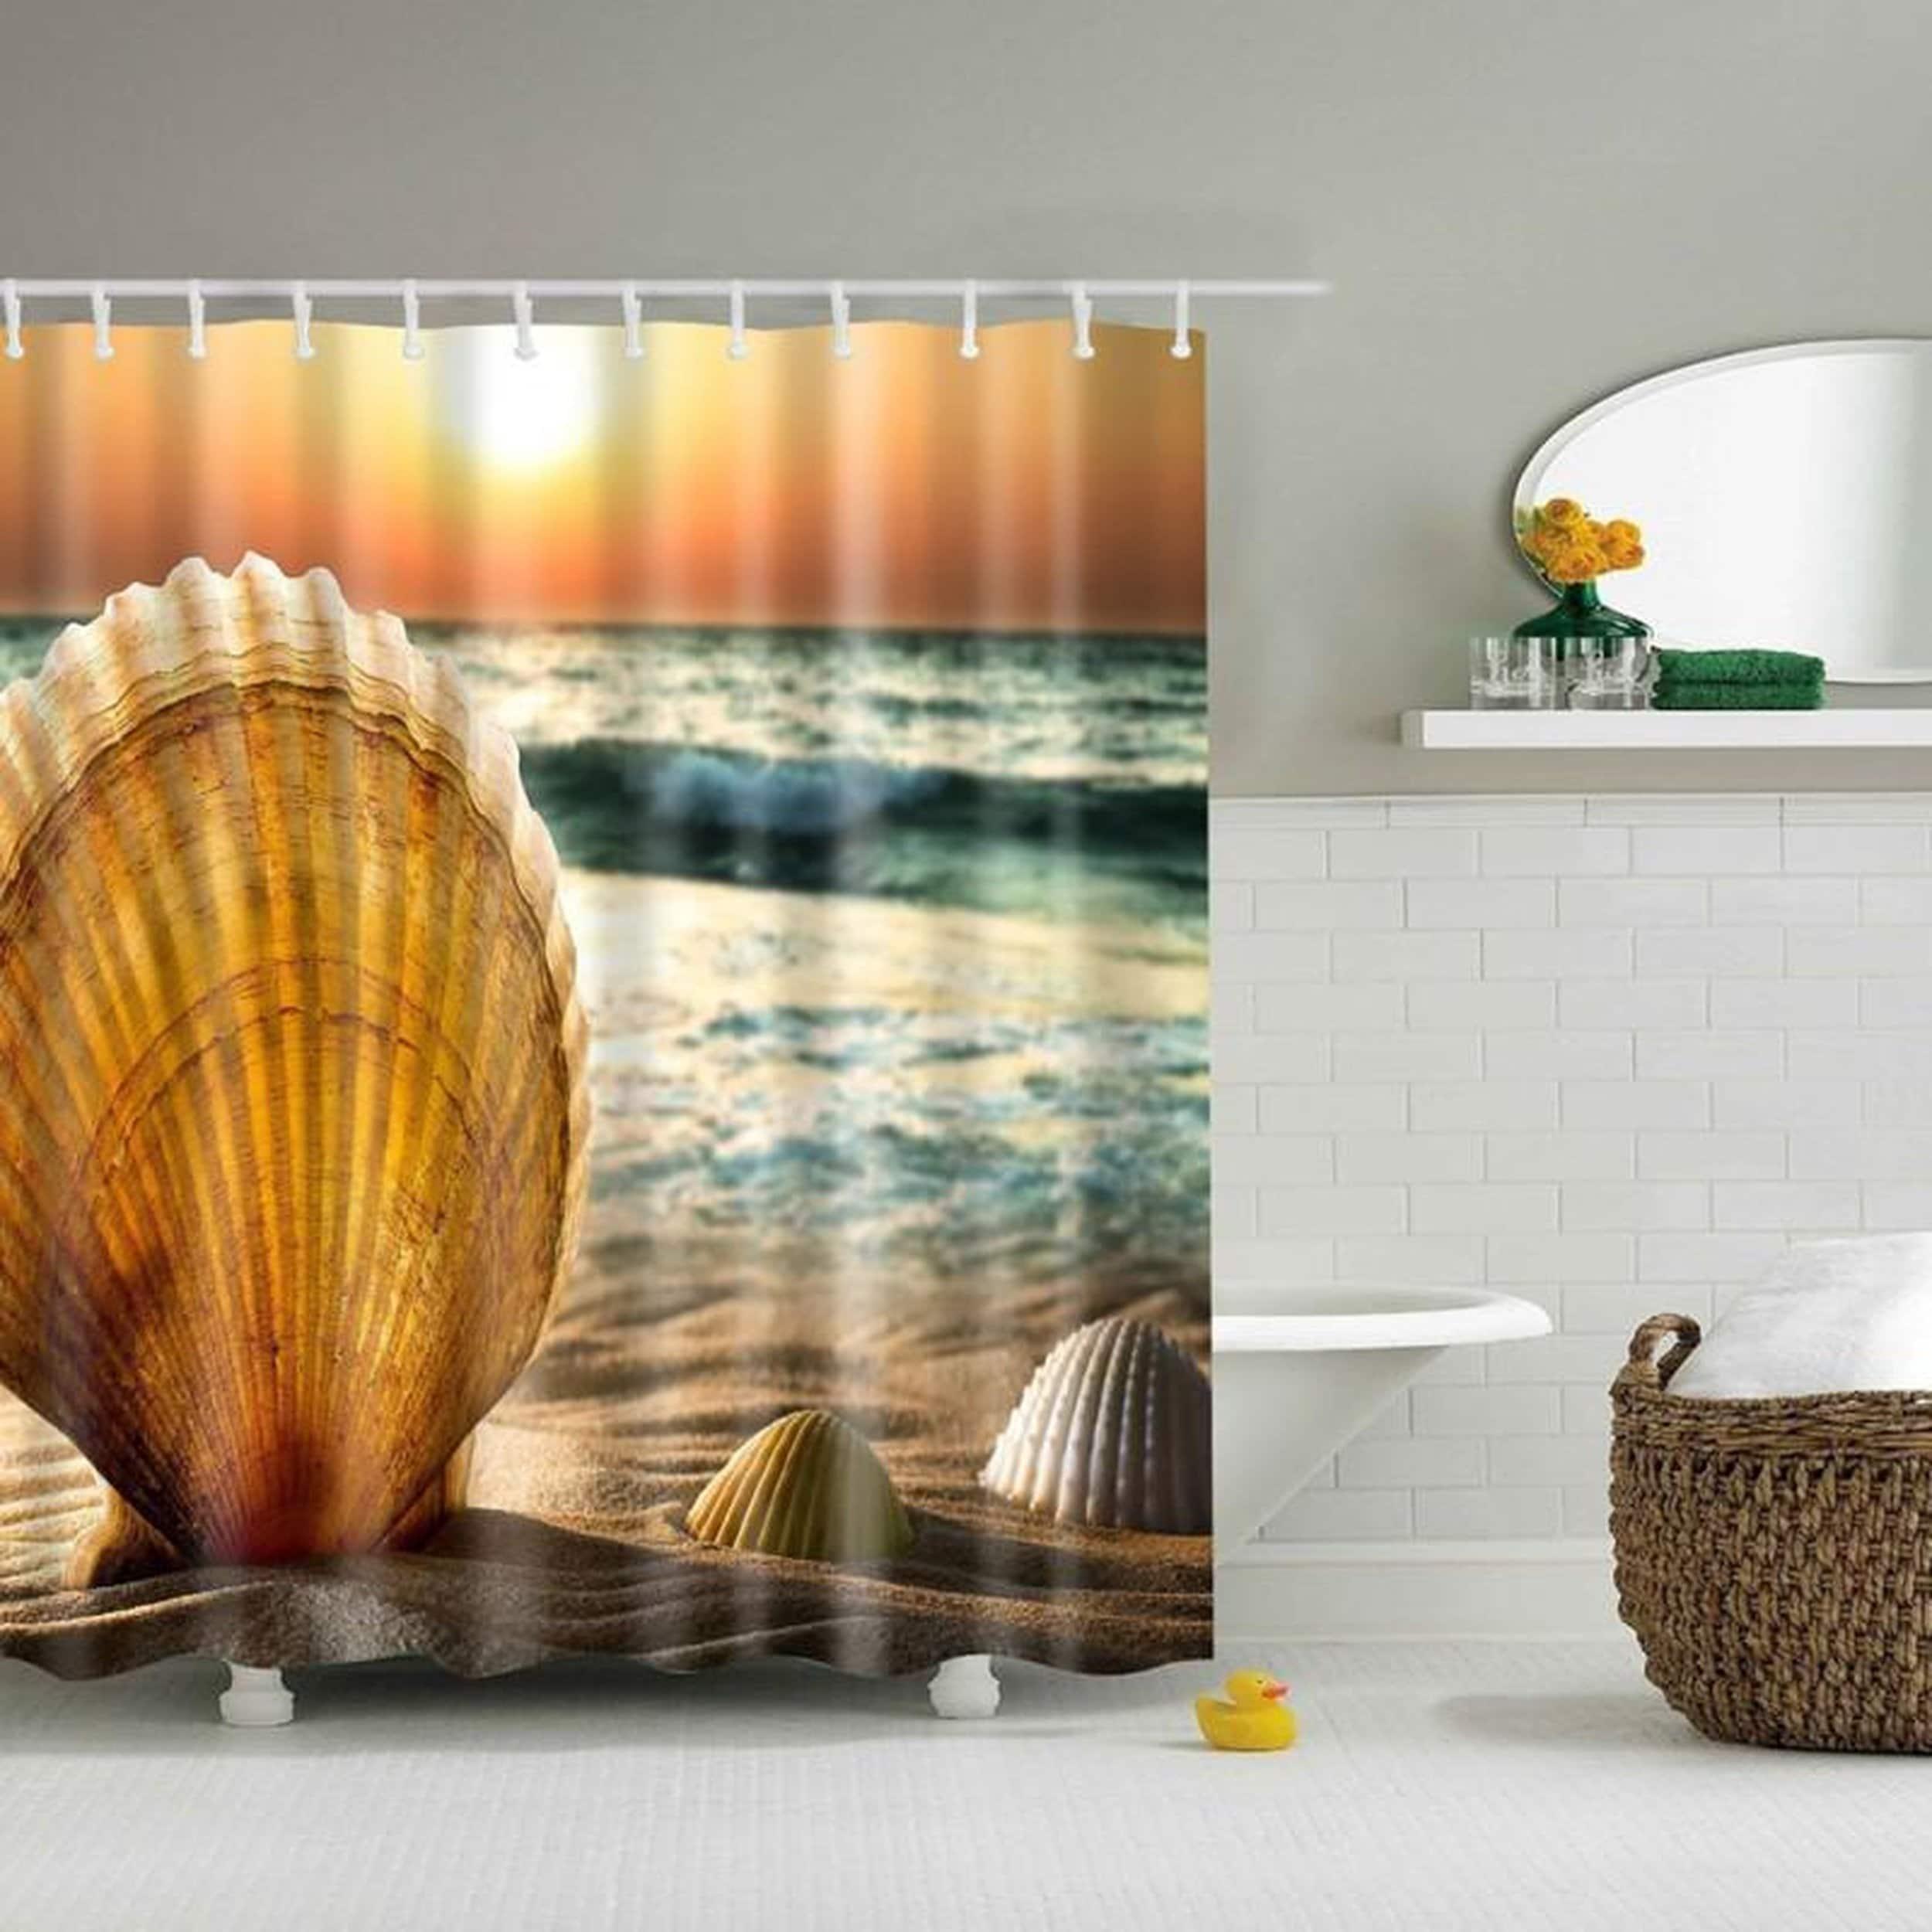 Shop Bathroom Shower Curtains Retro Fabric Waterproof